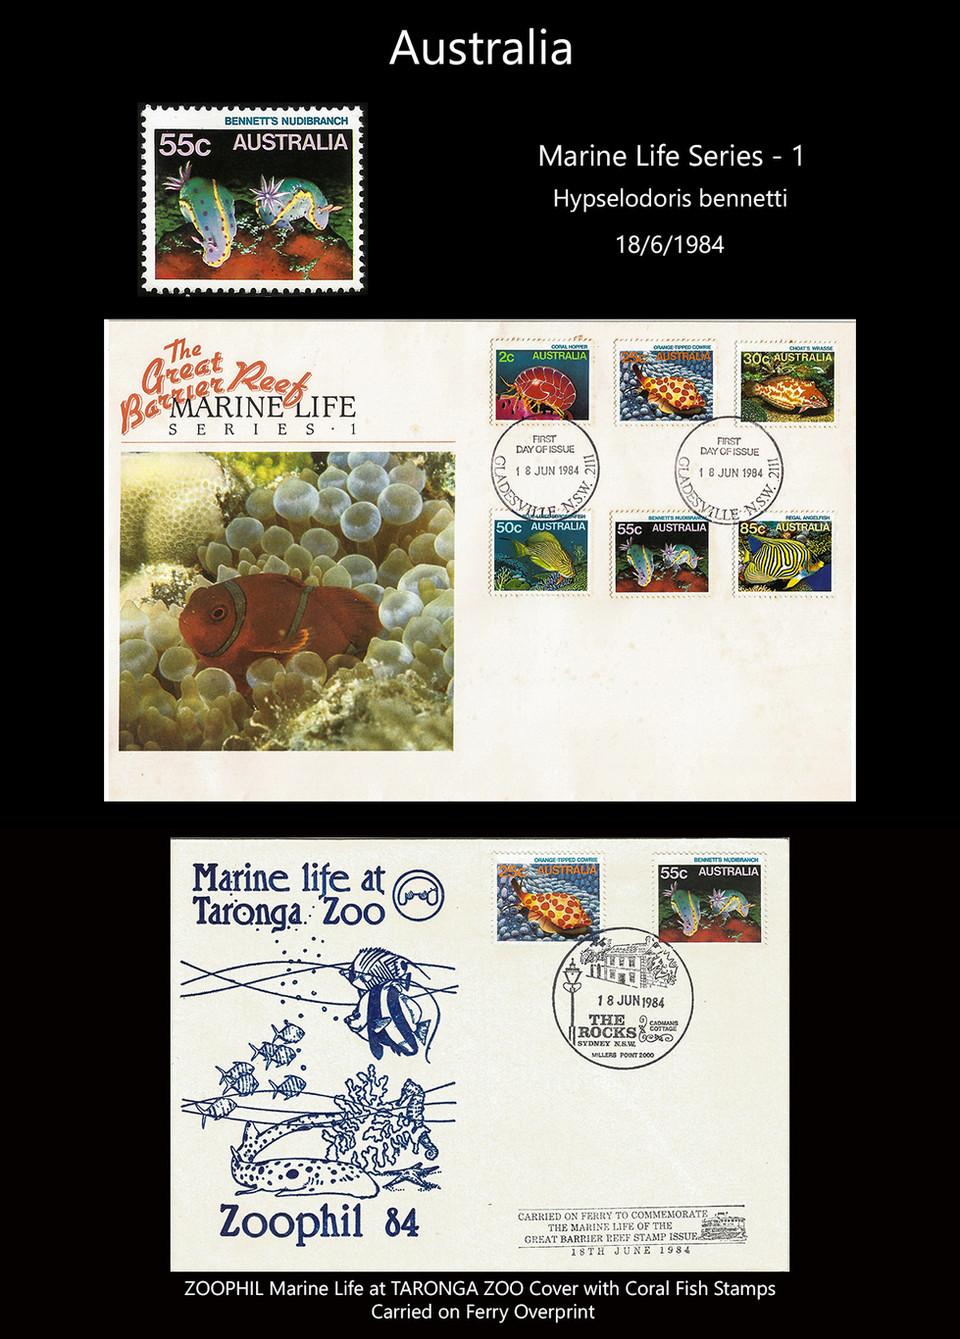 AUSTRALIA 1 Stamps & FDC